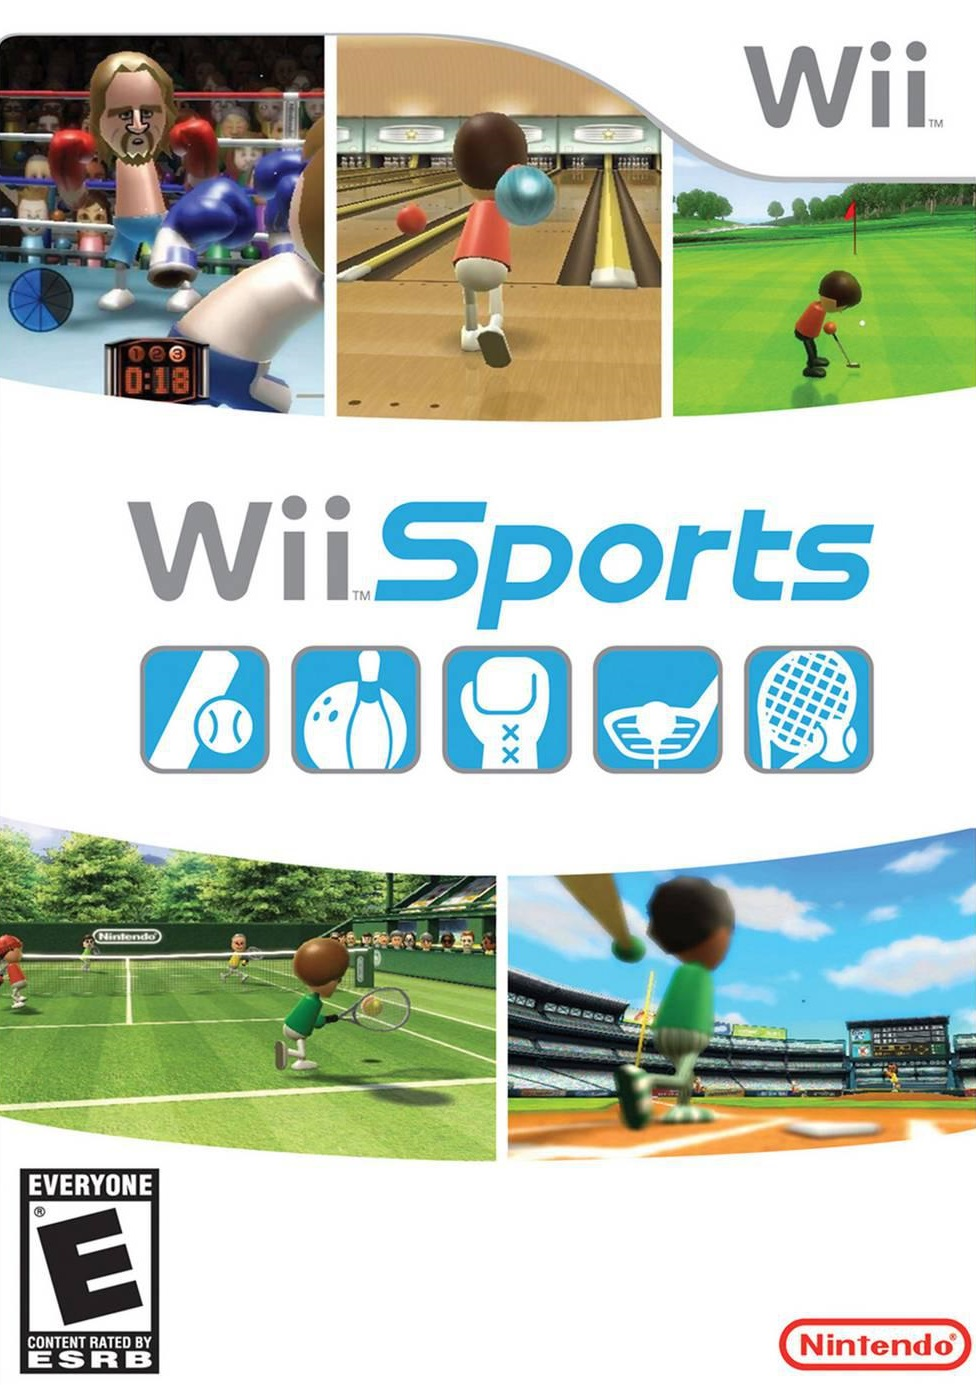 Wii Sports Nintendo WII Game